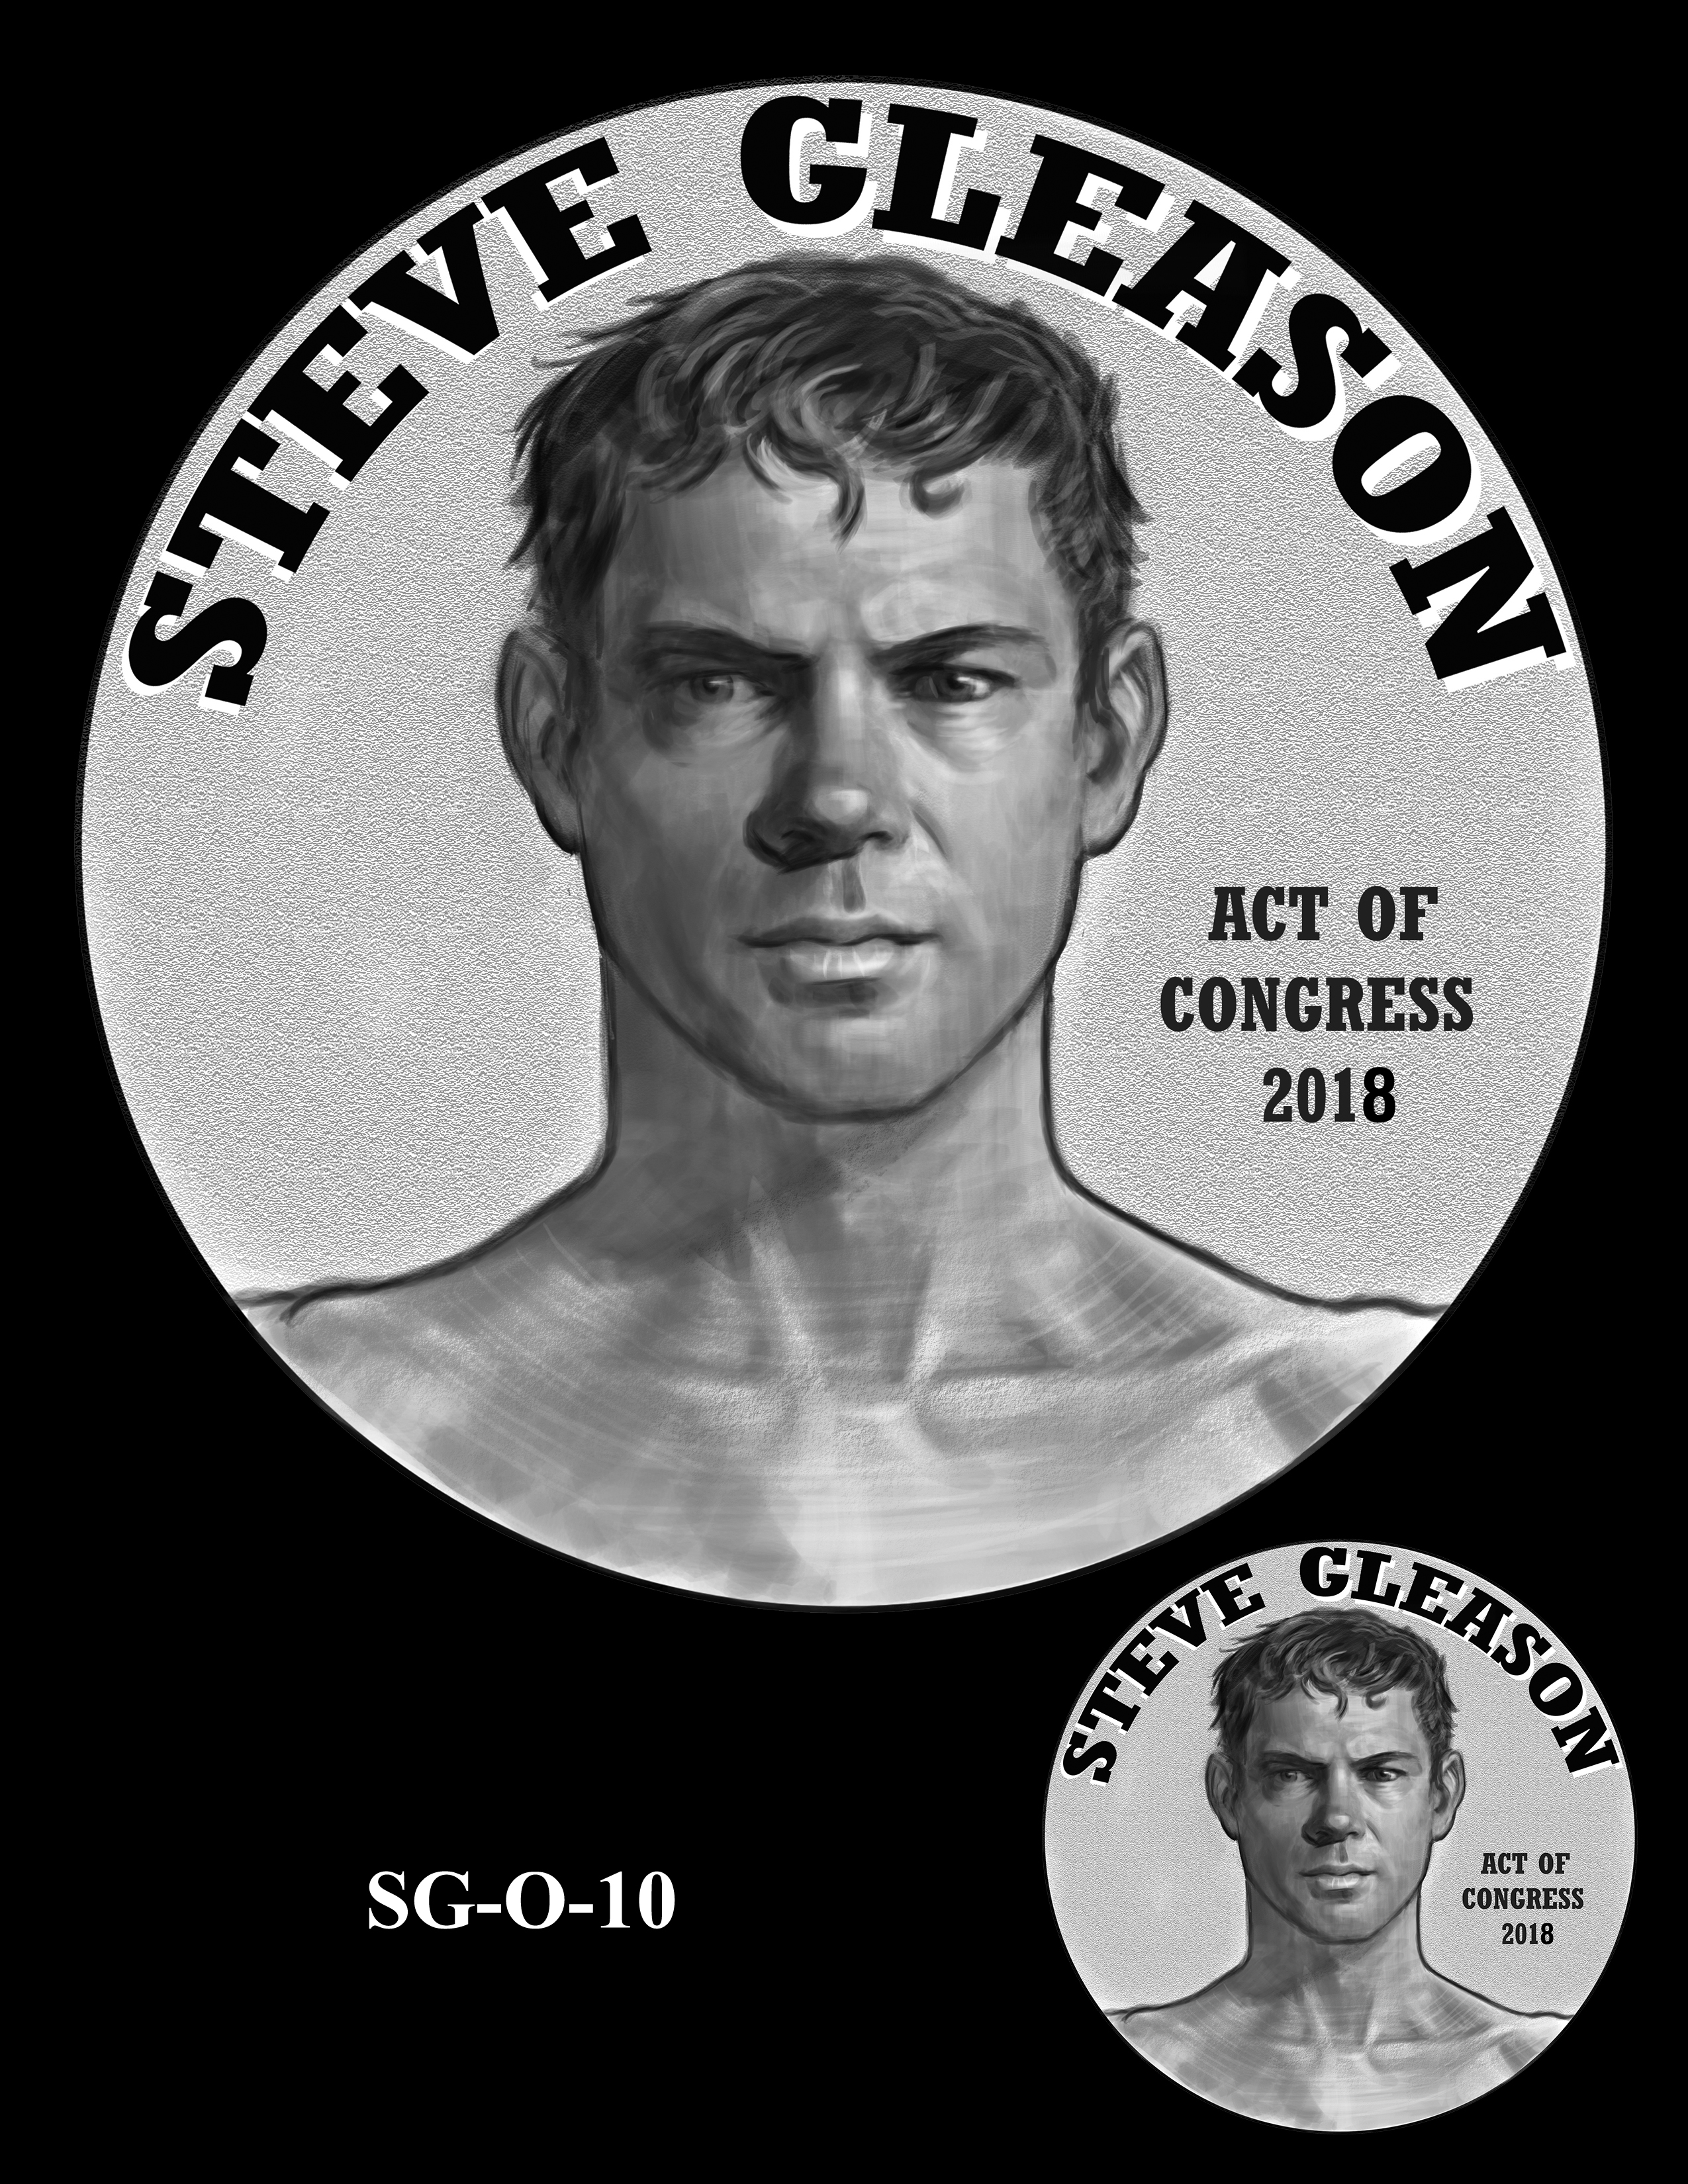 SG-O-10 -- Steve Gleason CGM Obverse